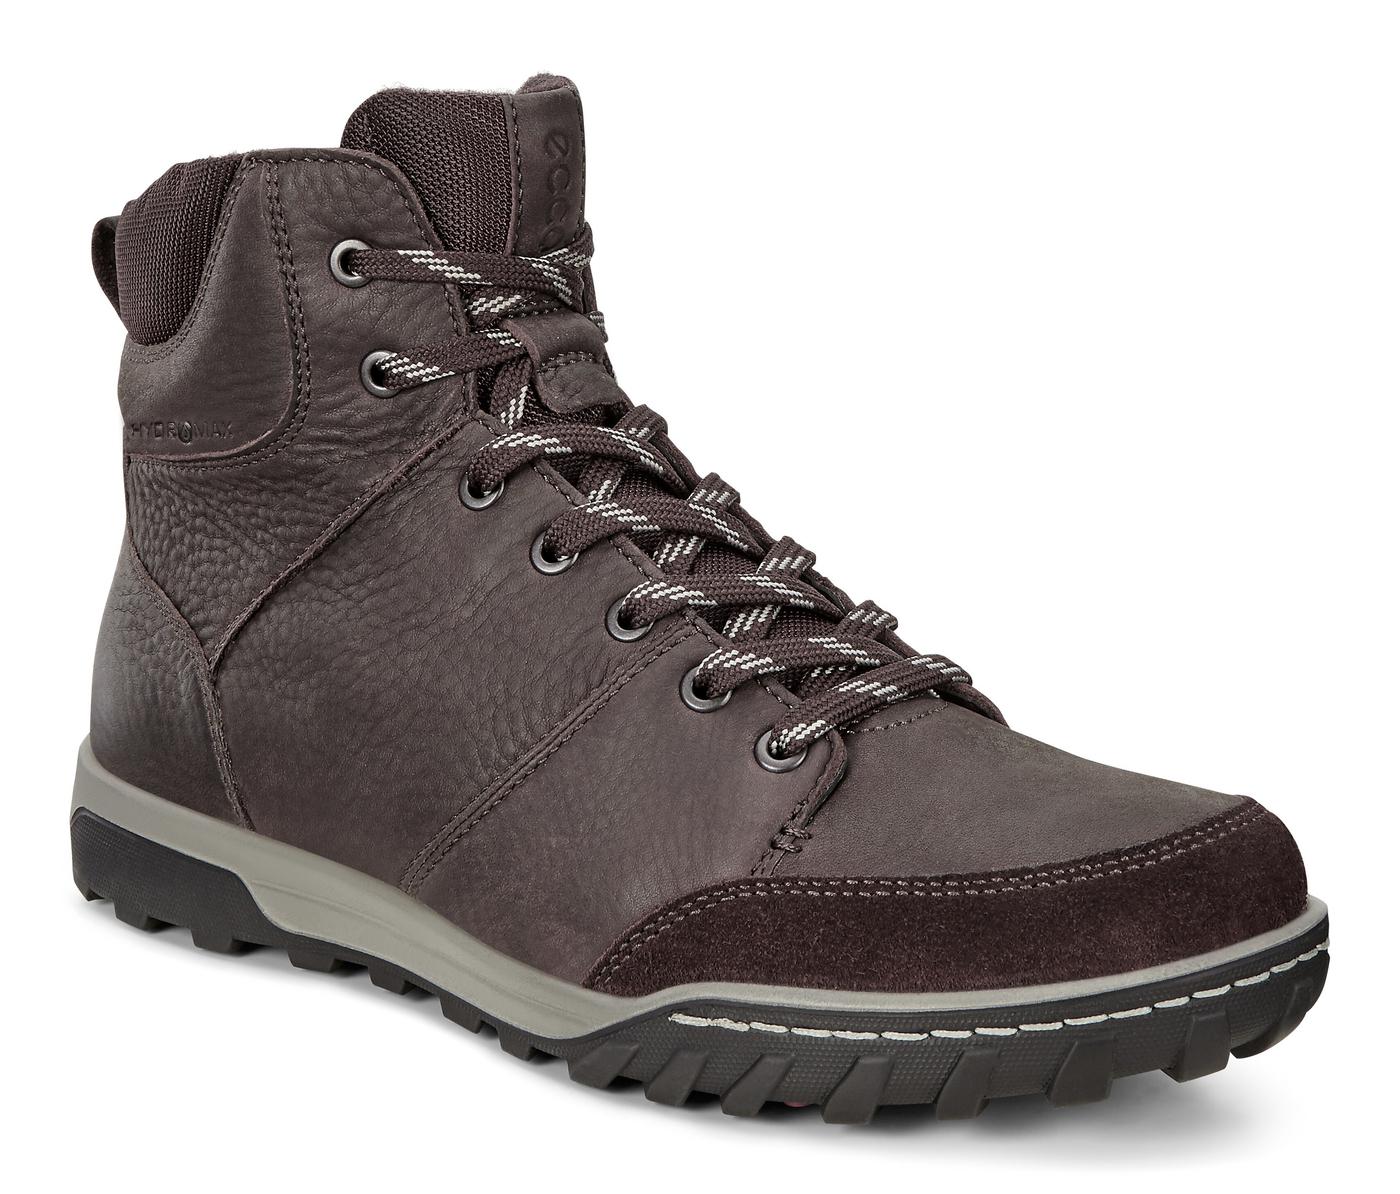 ECCO URBAN LIFESTYLE Outdoor Shoe